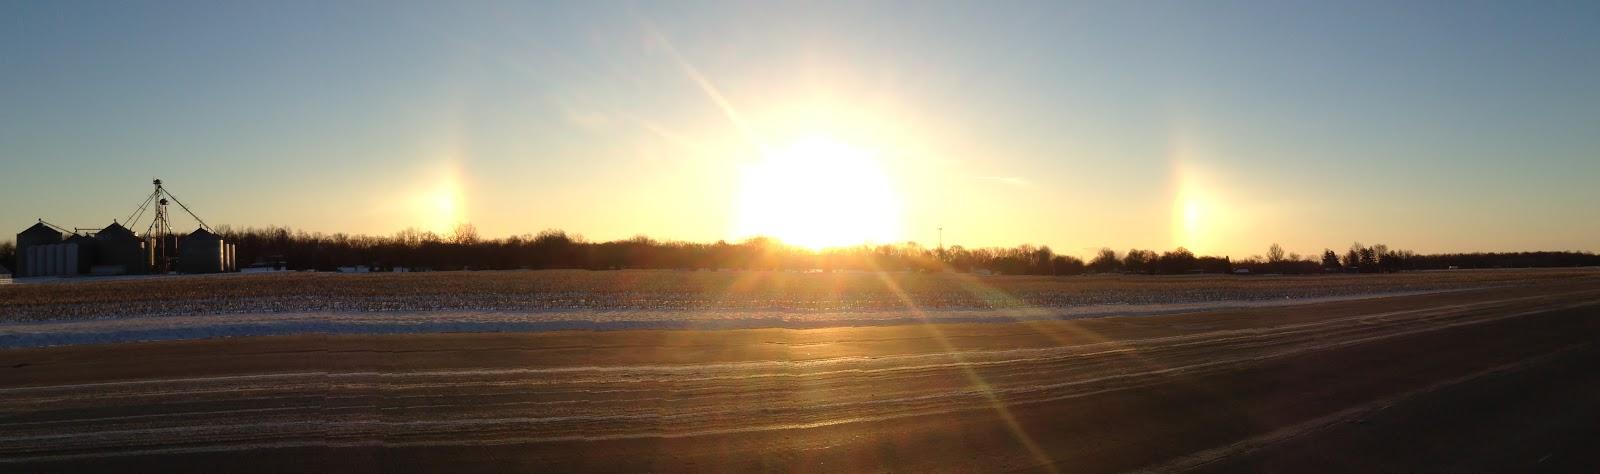 sun dog lights on both sides of the sun